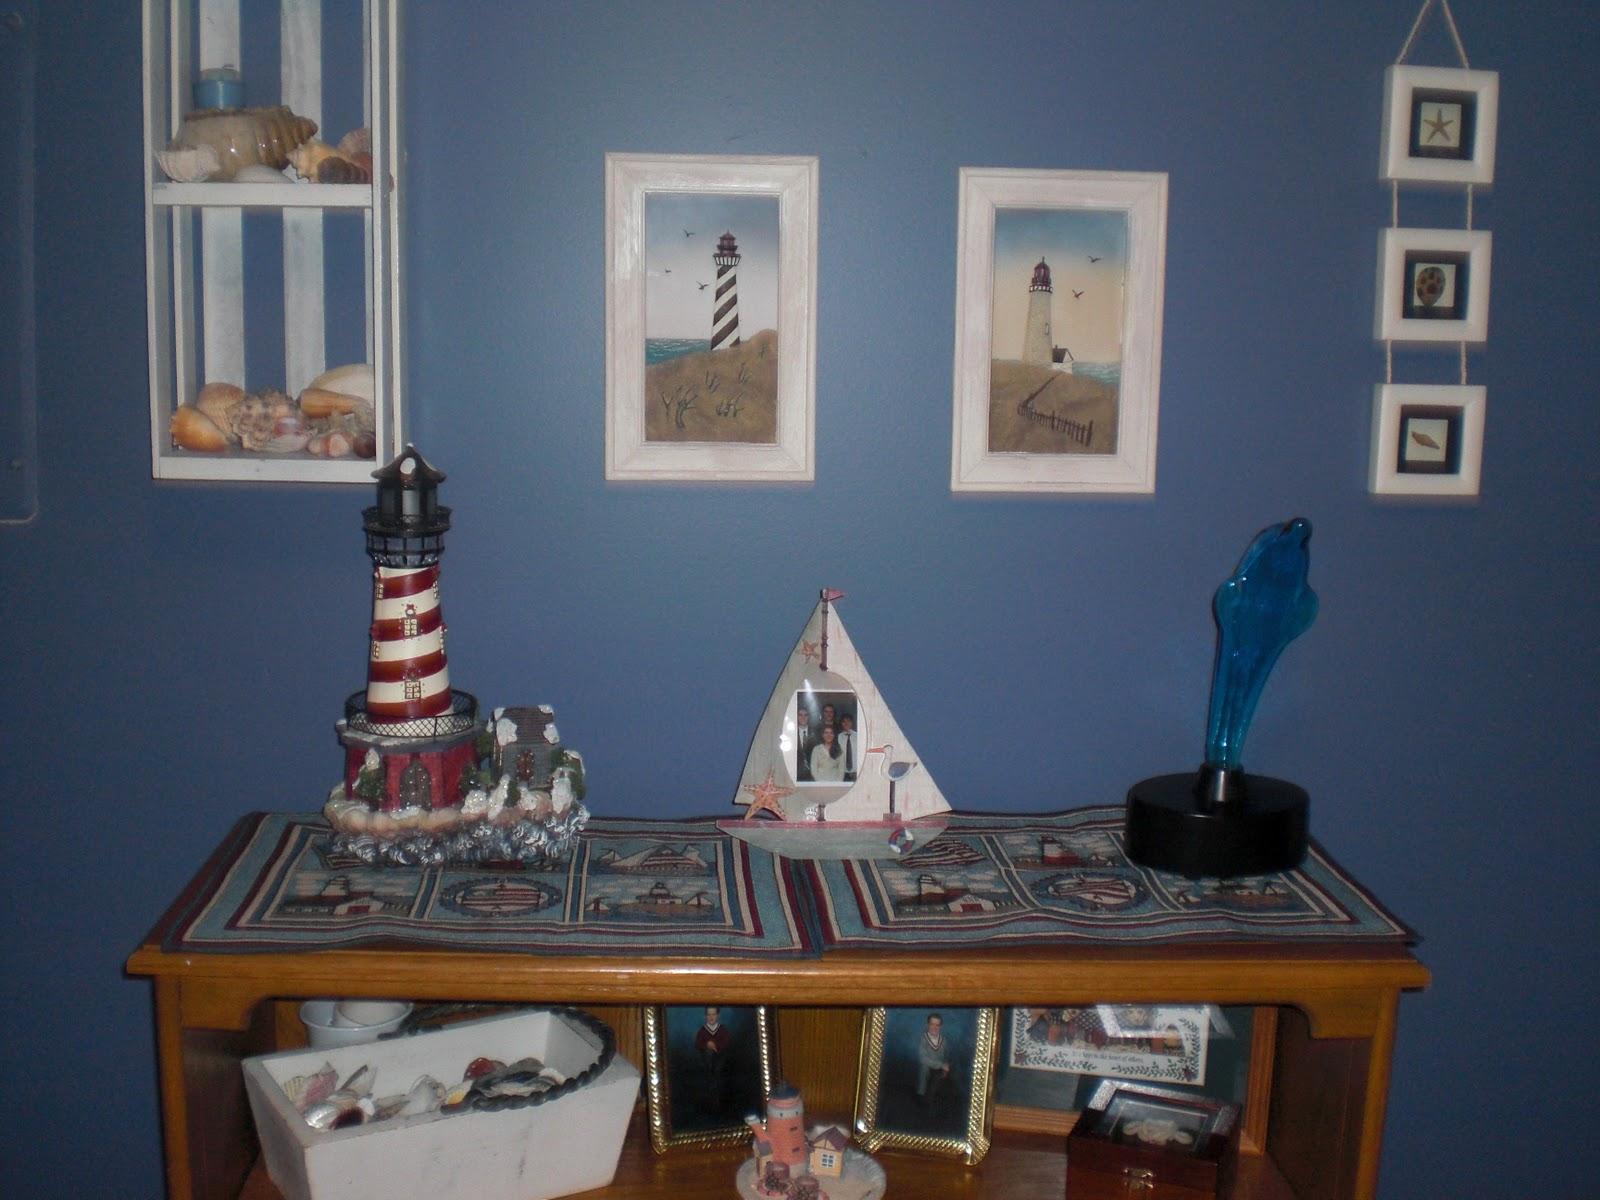 Lighthous Bathroom Decor Ideas: Pattie's Place: Beachy Bedroom Redo